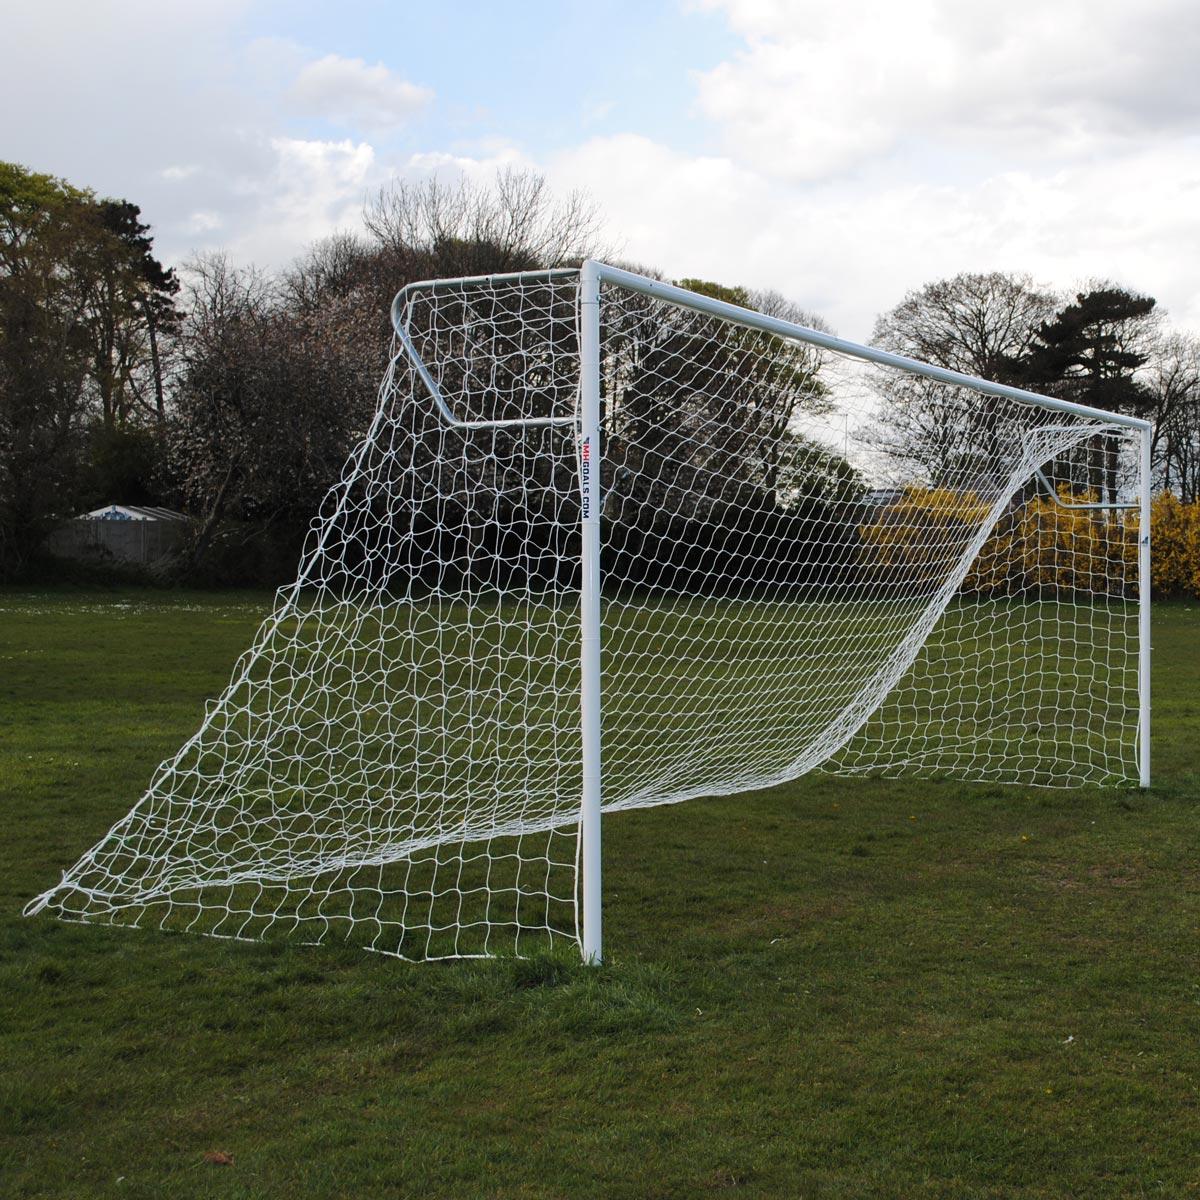 Senior Heavy Duty 24x8 Football Goal Package: 11-A-Side Socketed Steel